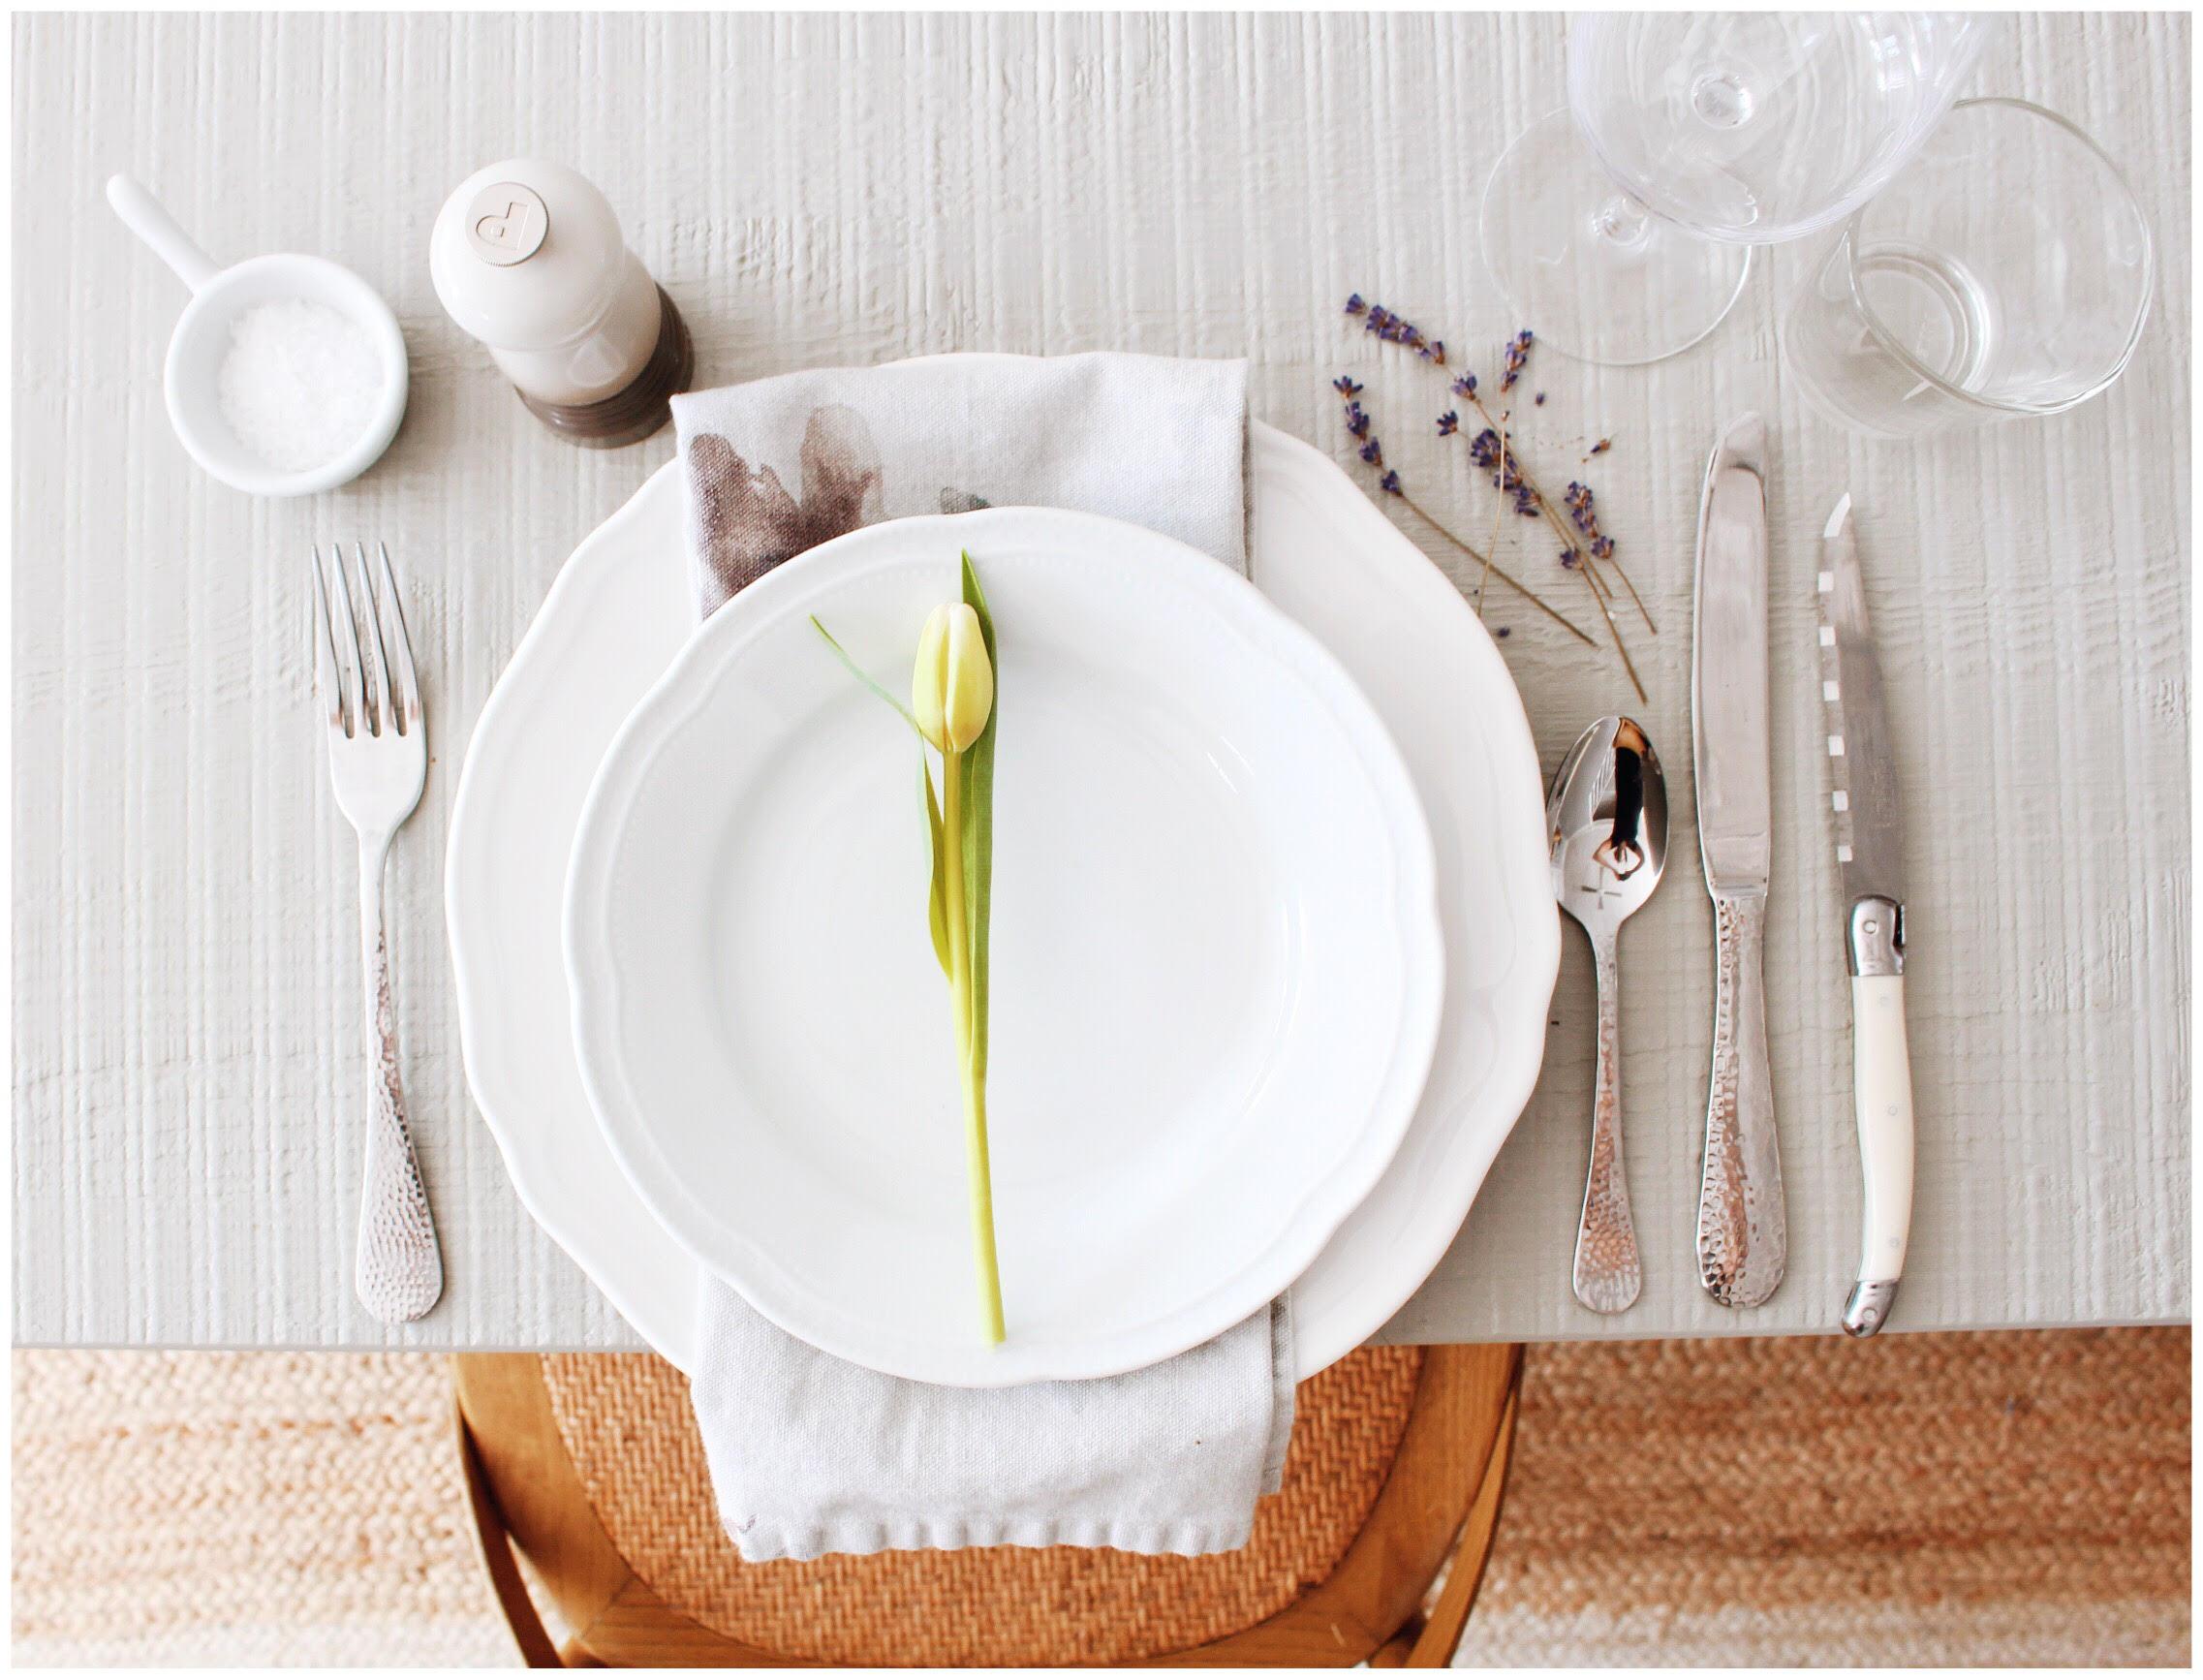 spring tabletop setting.JPG